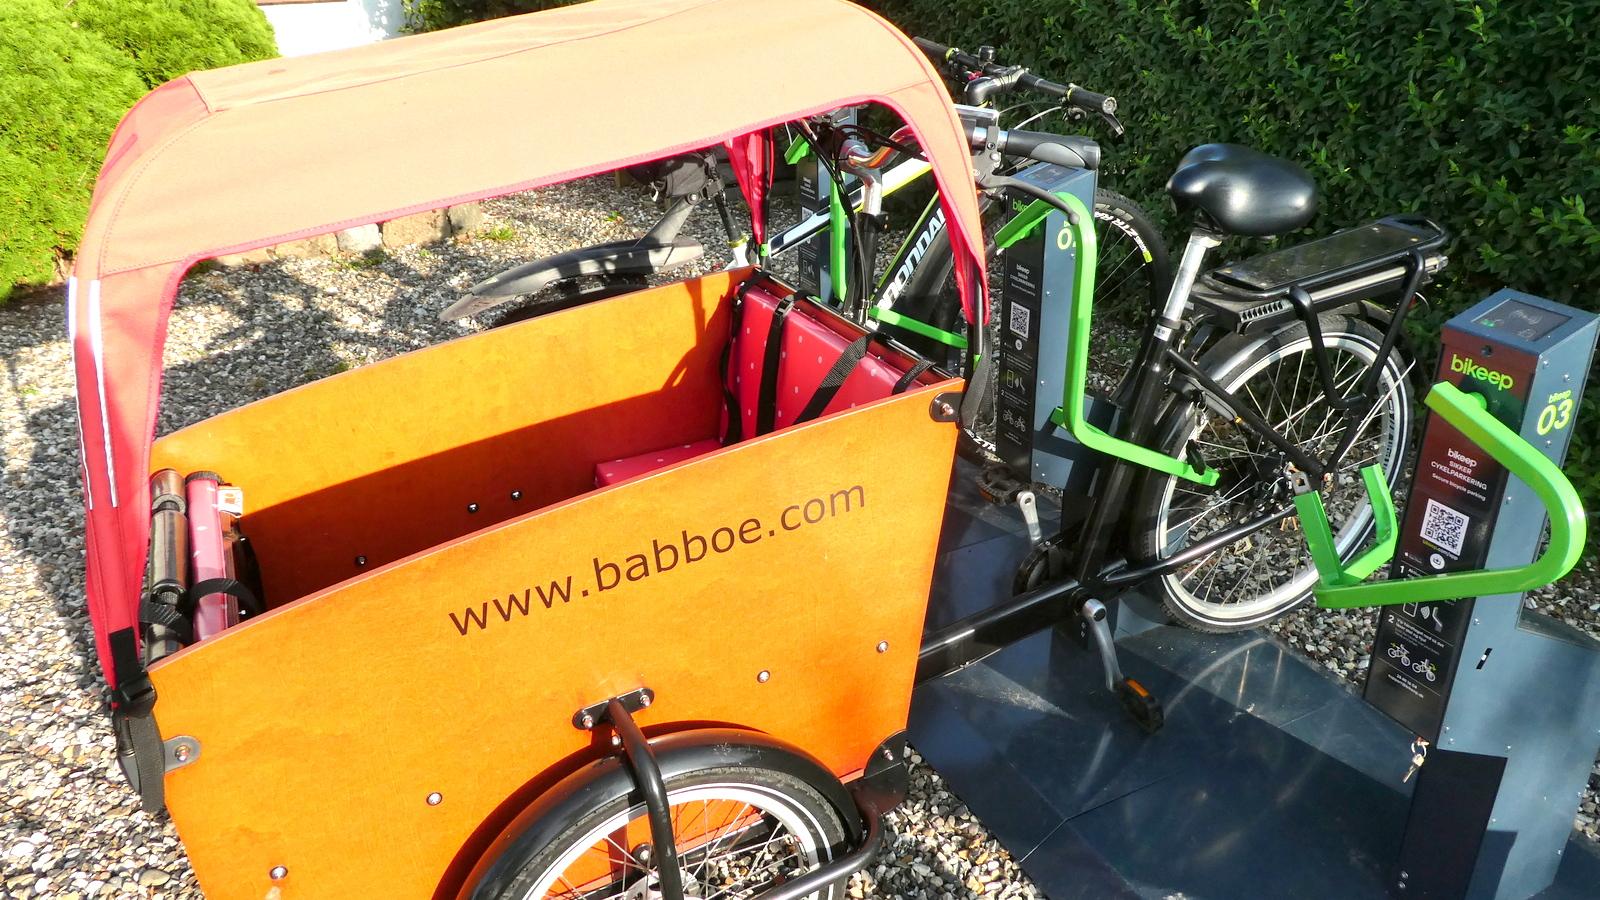 Ladcykel i Bikeep - fra siden